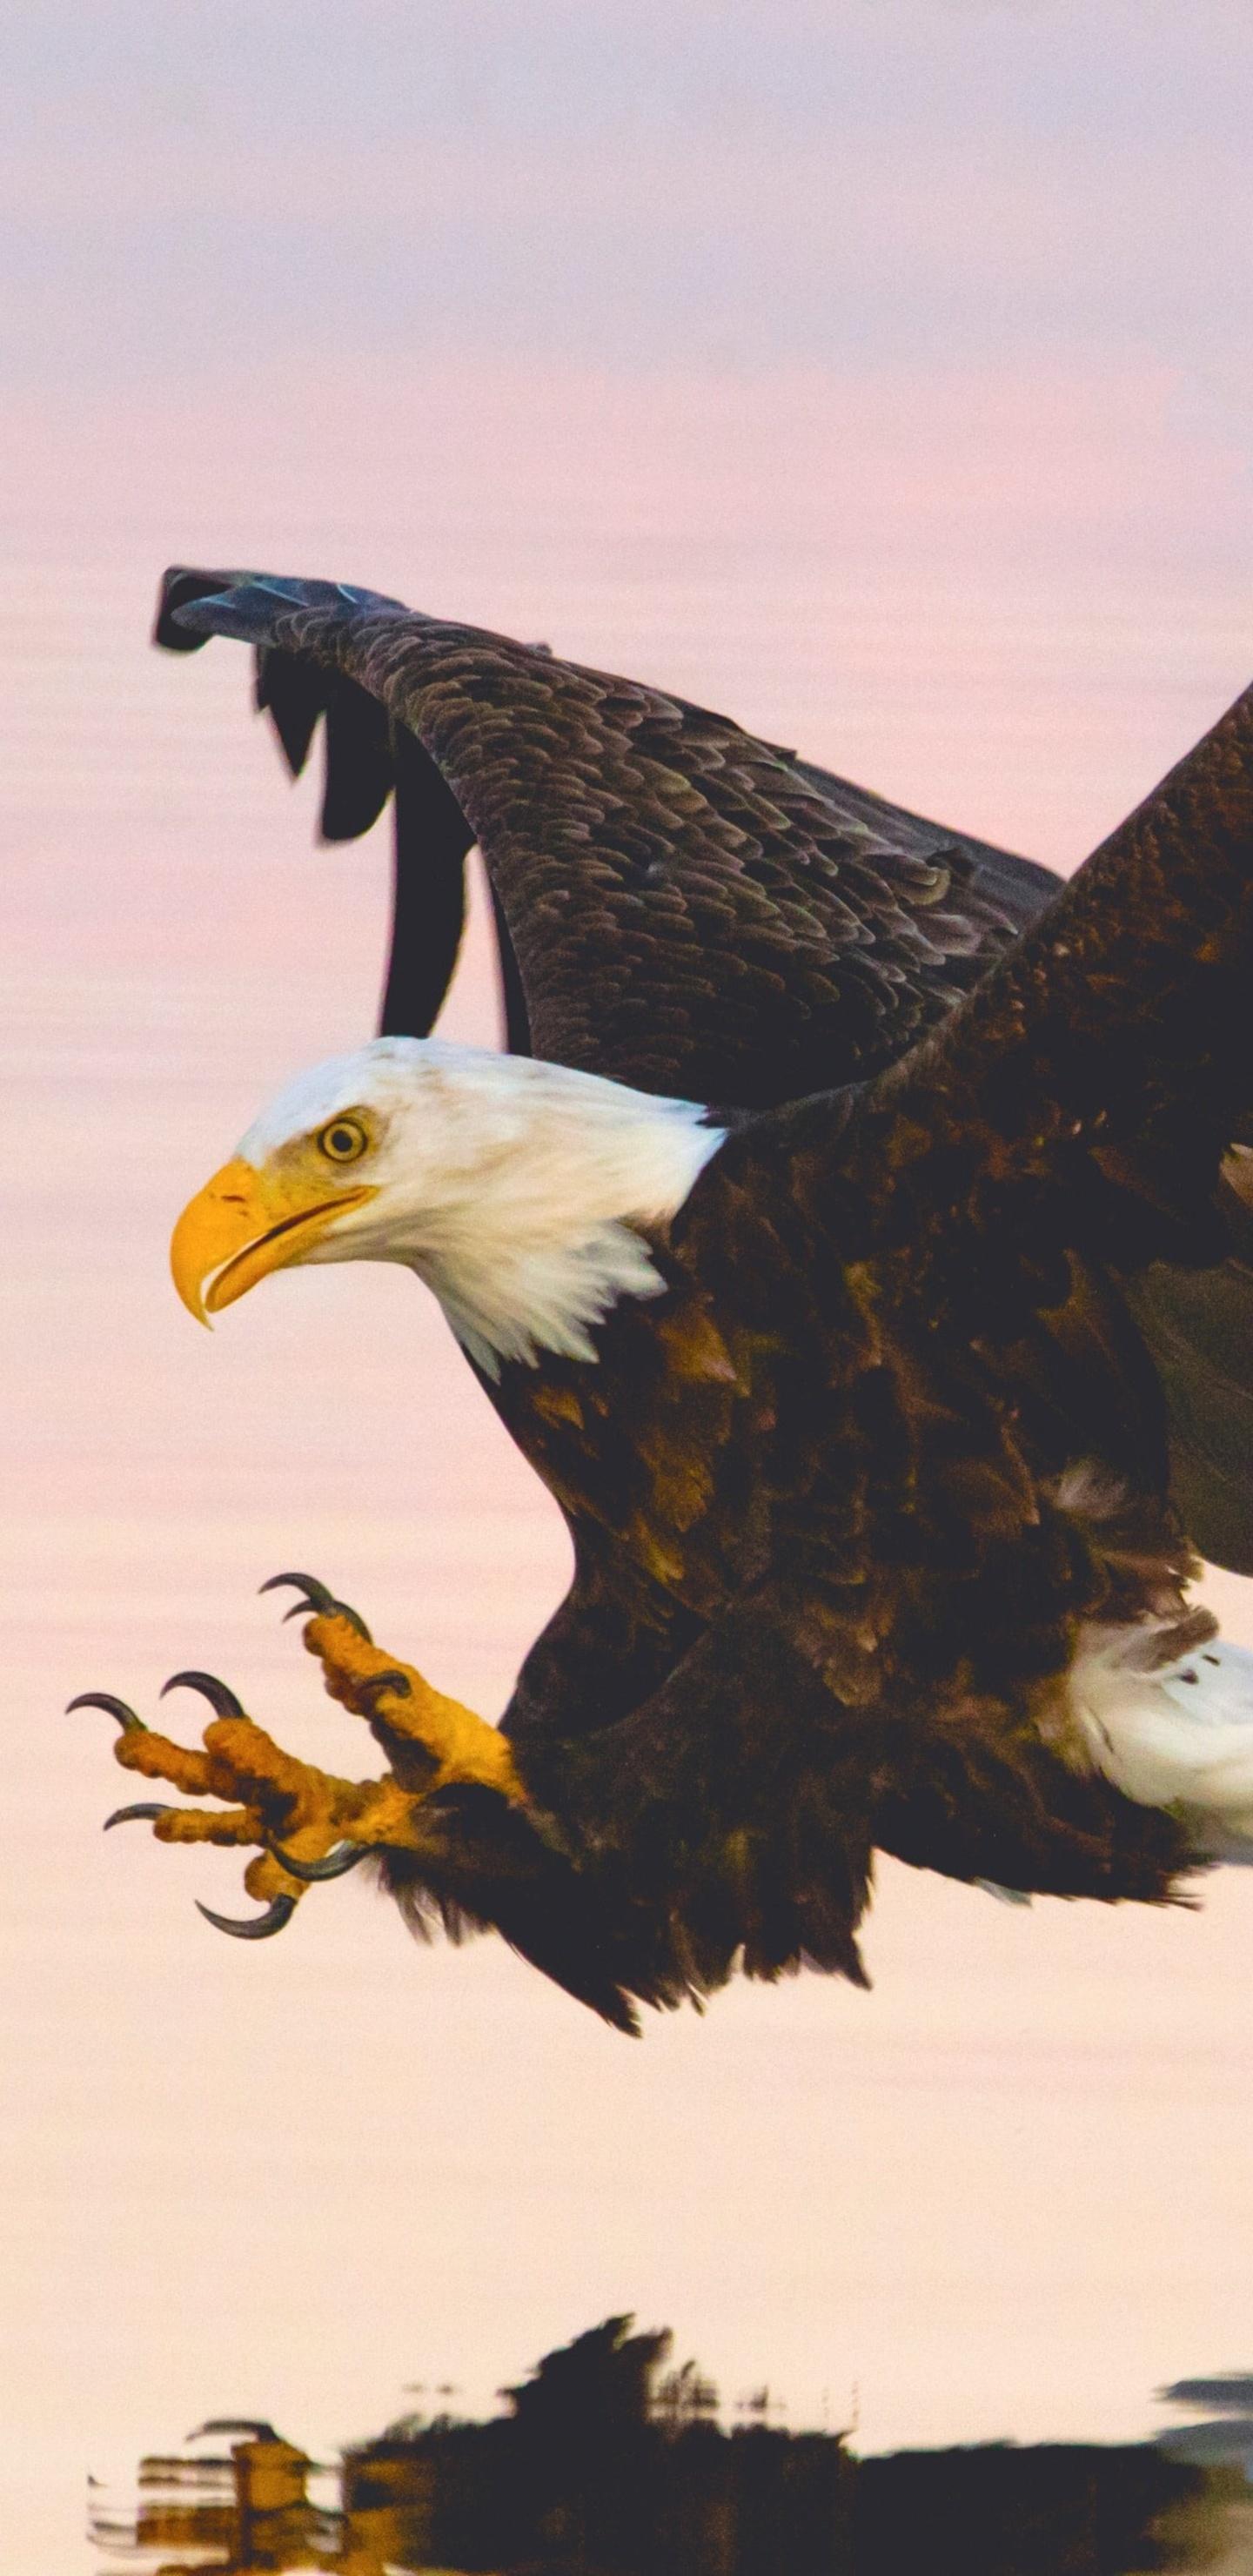 soaring-eagle-over-water-body-et.jpg